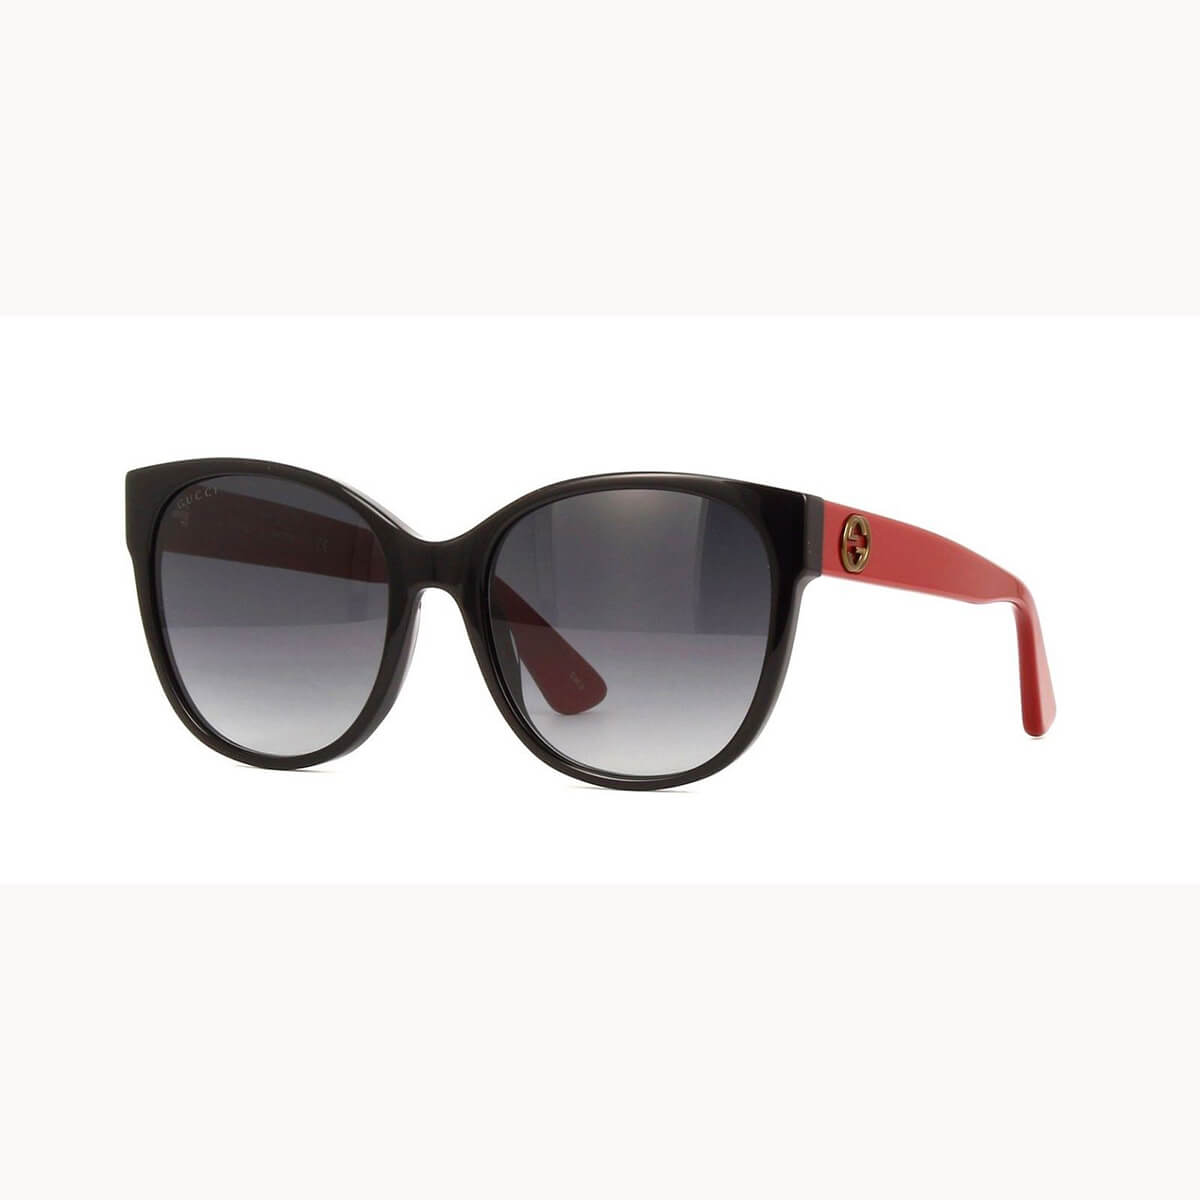 52d3e07d328c2 Gucci Women GG0097S 005 Black Red Cat Eye Sunglasses